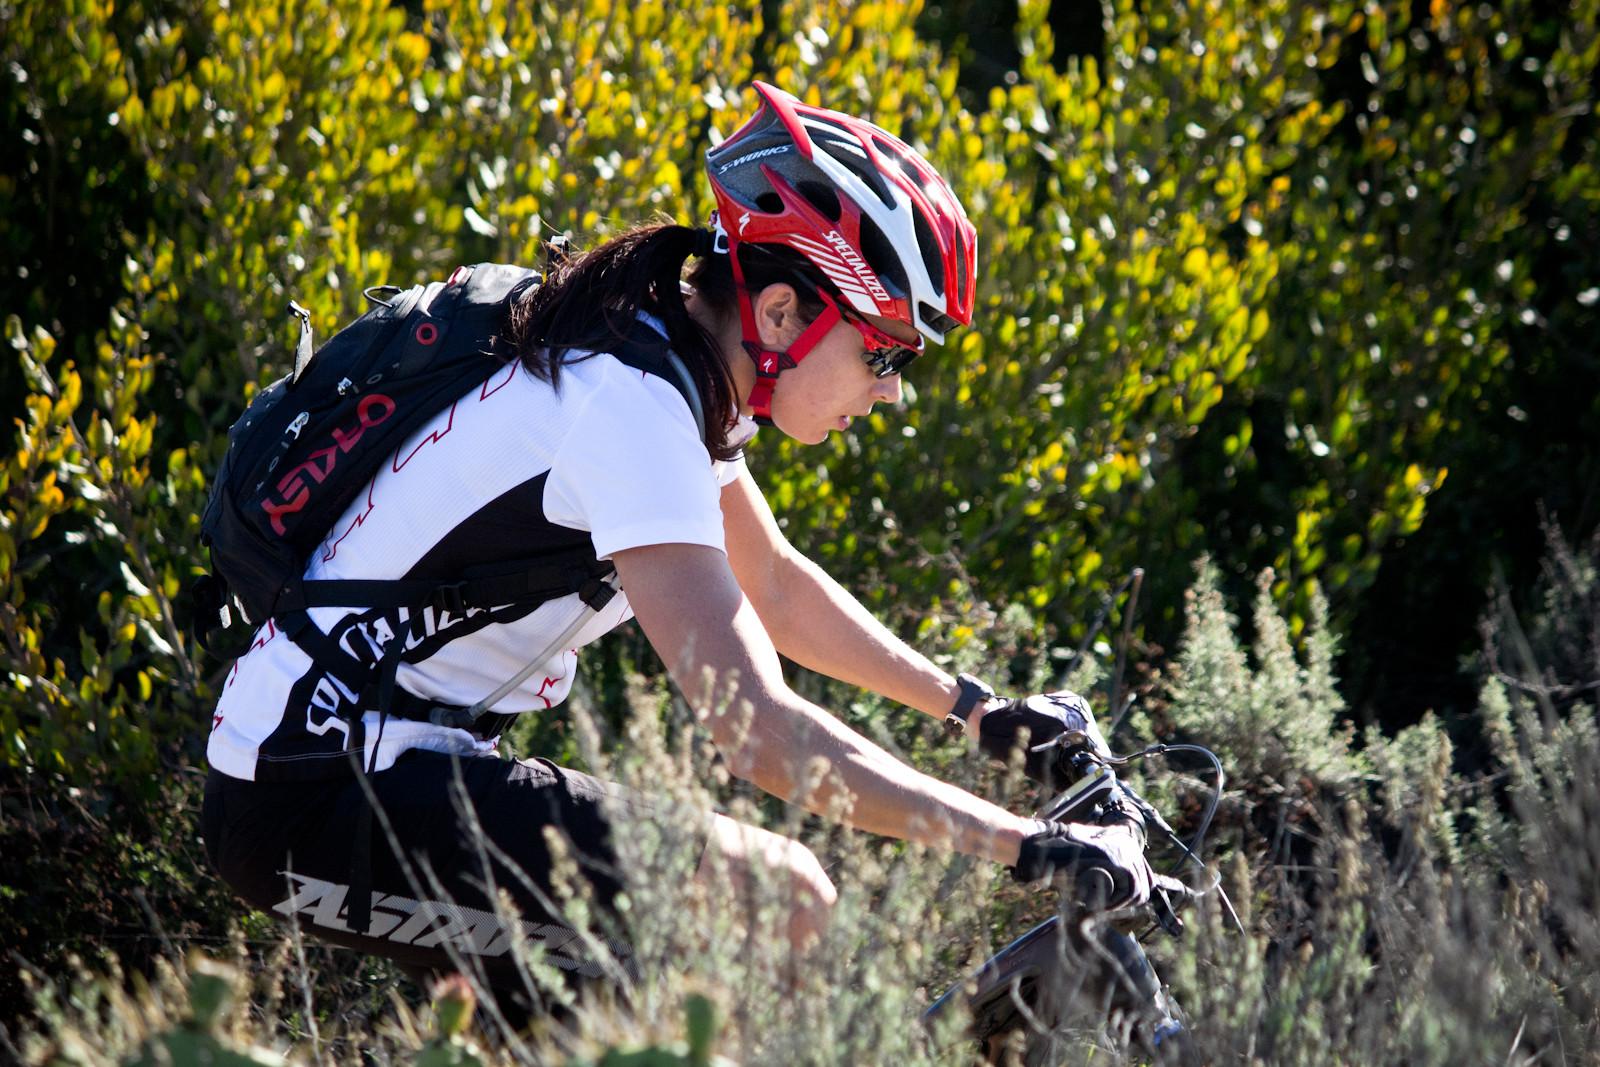 Anneke Beerten - Specialized A1 Ride Daze - In Memory of Burry Stander - Mountain Biking Pictures - Vital MTB